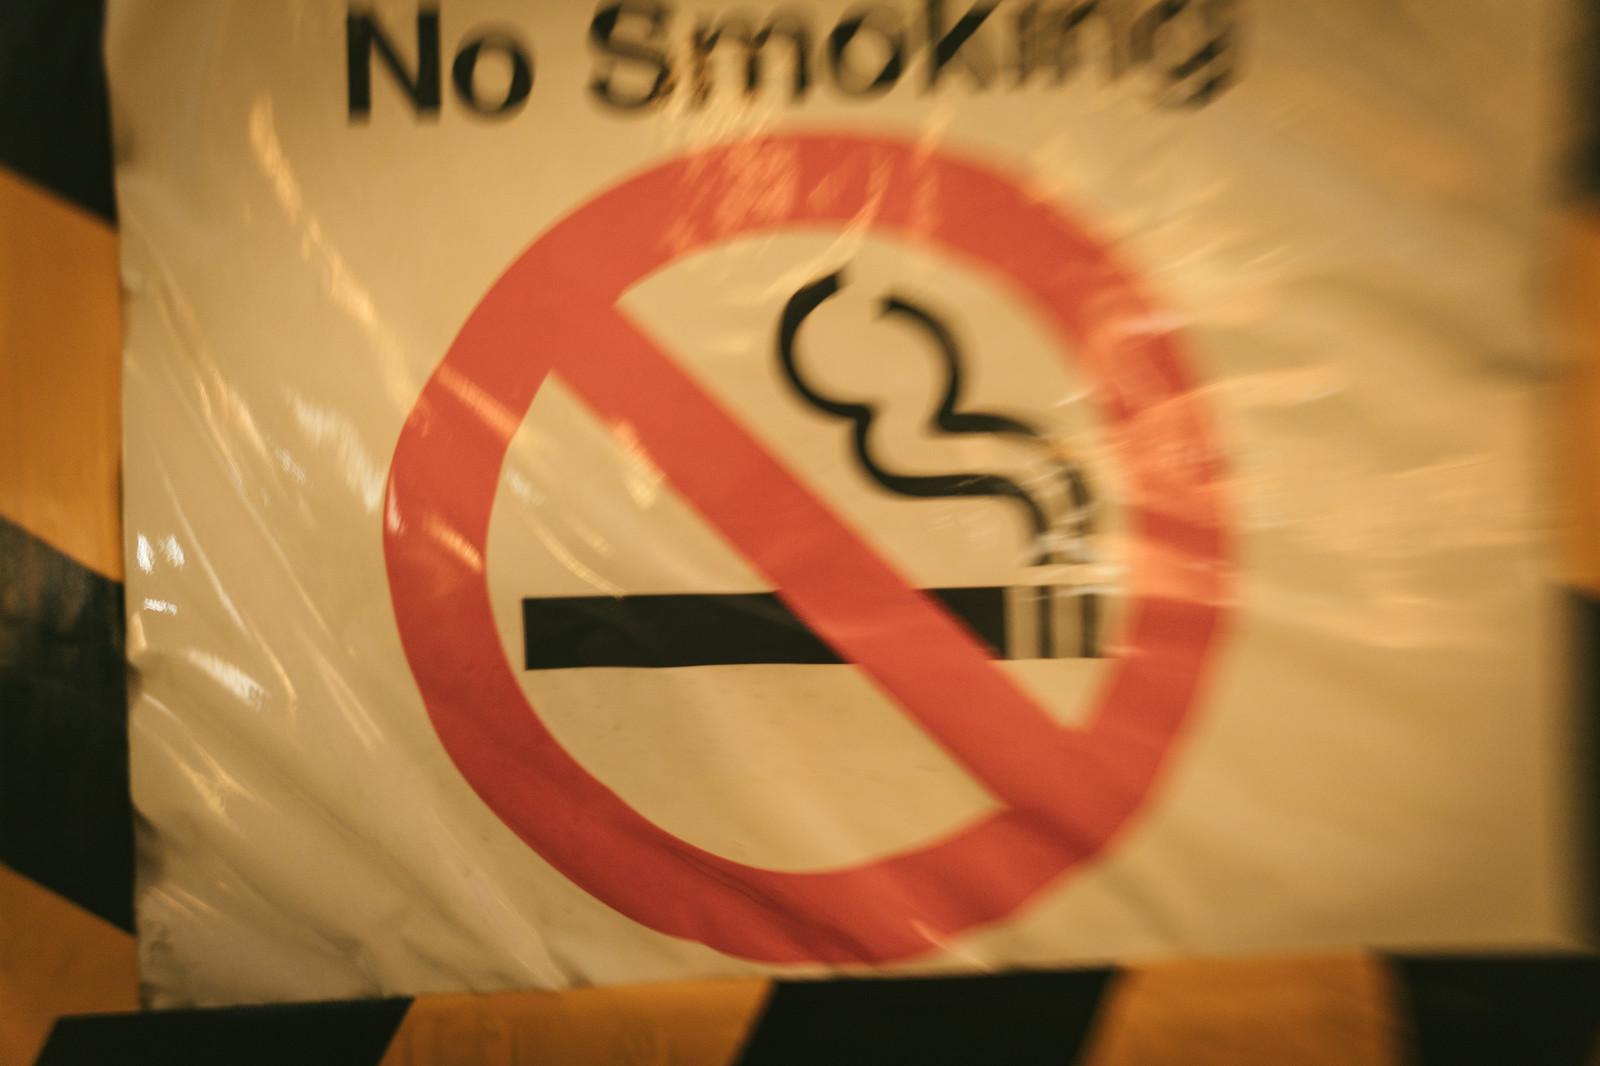 smokingIMGL3566 TP V - 【TIPS】私はコレで救われた気が!ベイプって神だと思った3つの理由